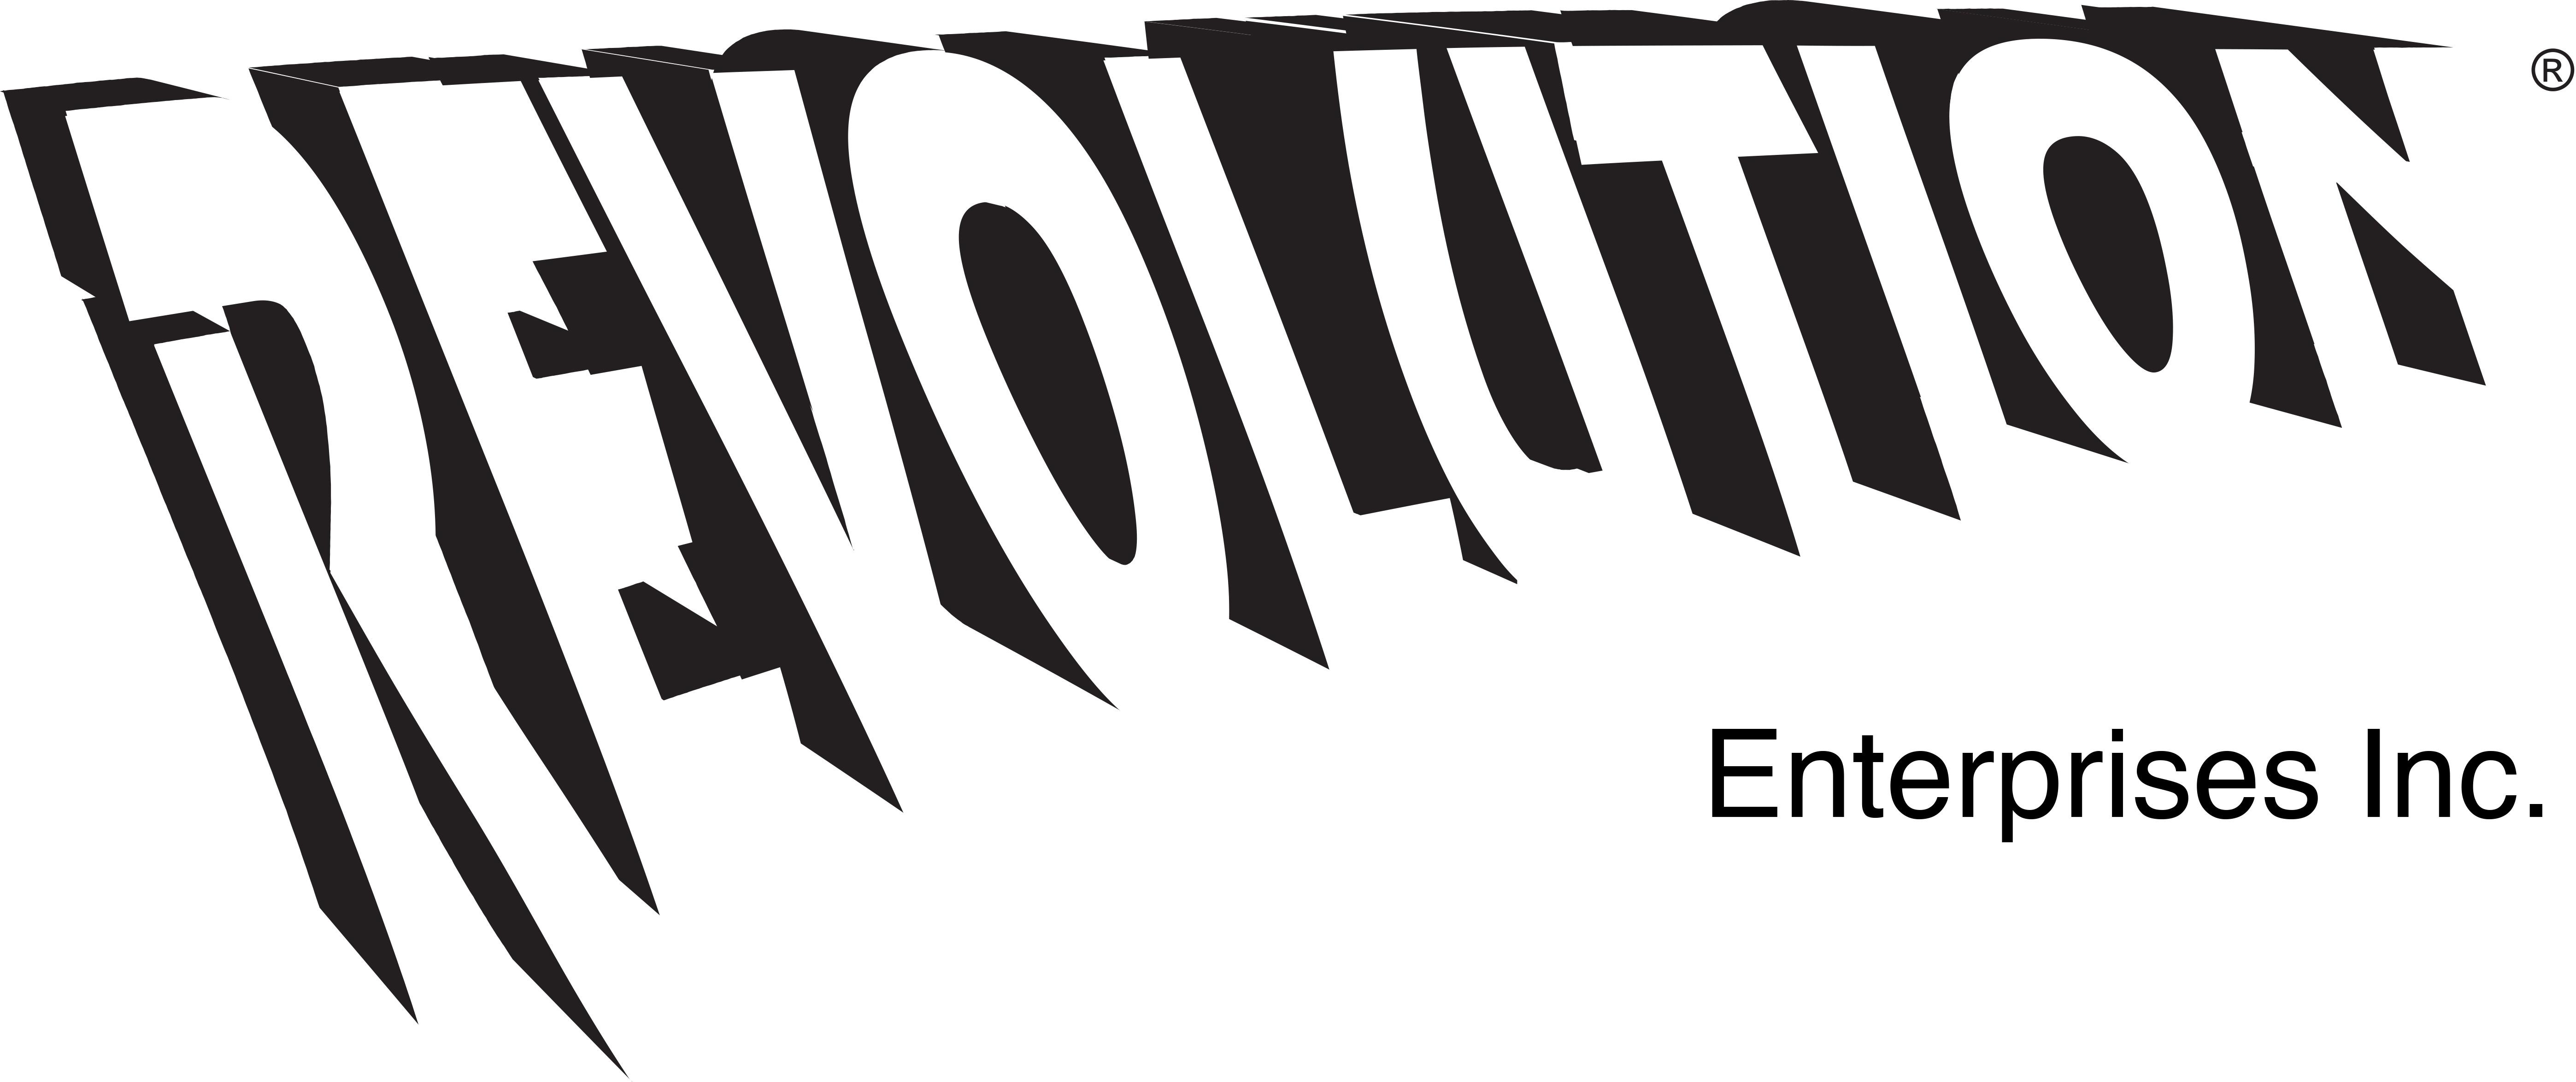 Revolution Enterprises Inc.